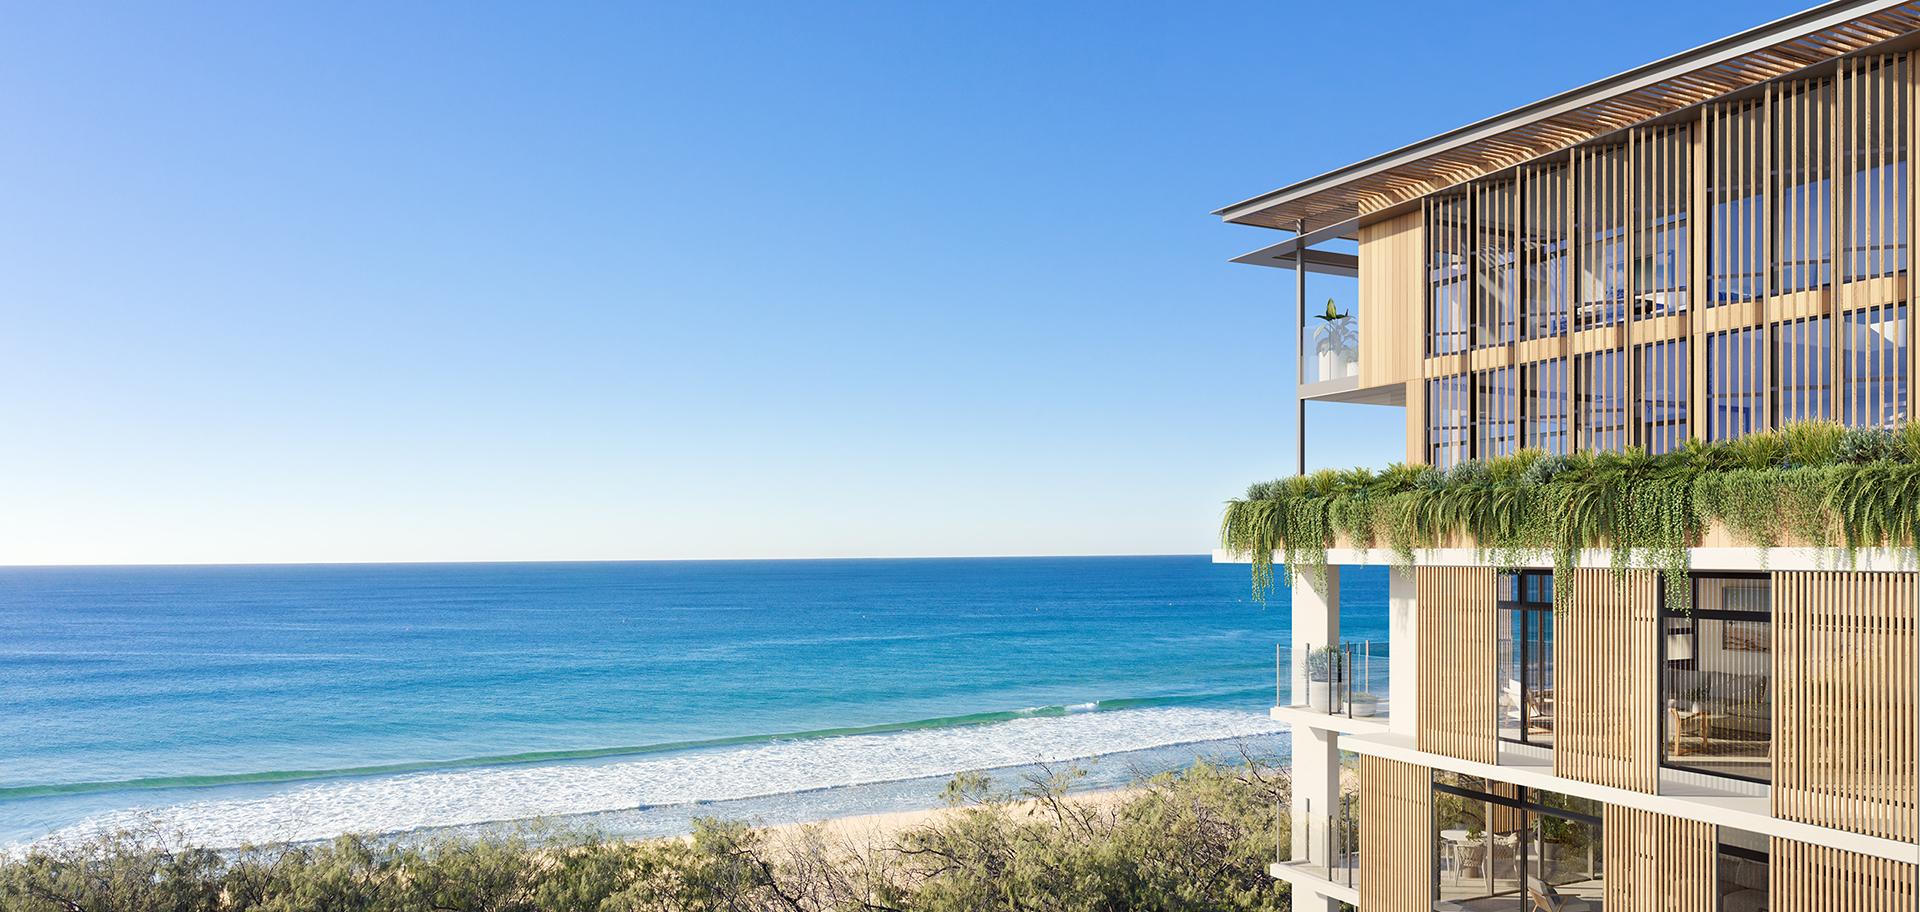 AX2 Studio - The Beachfront